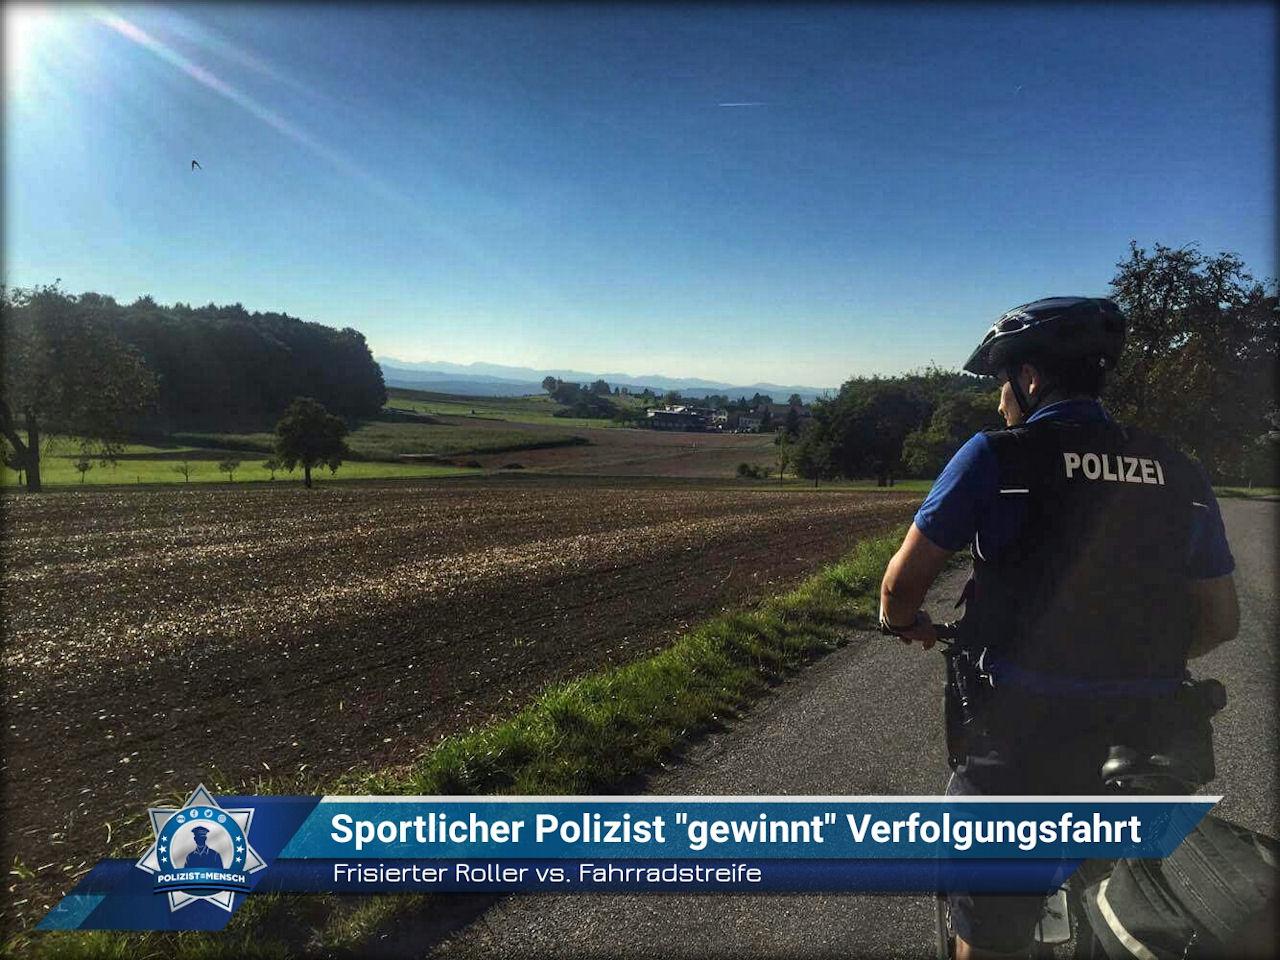 Frisierter Roller vs Fahrradstreife Sportlicher Polizist